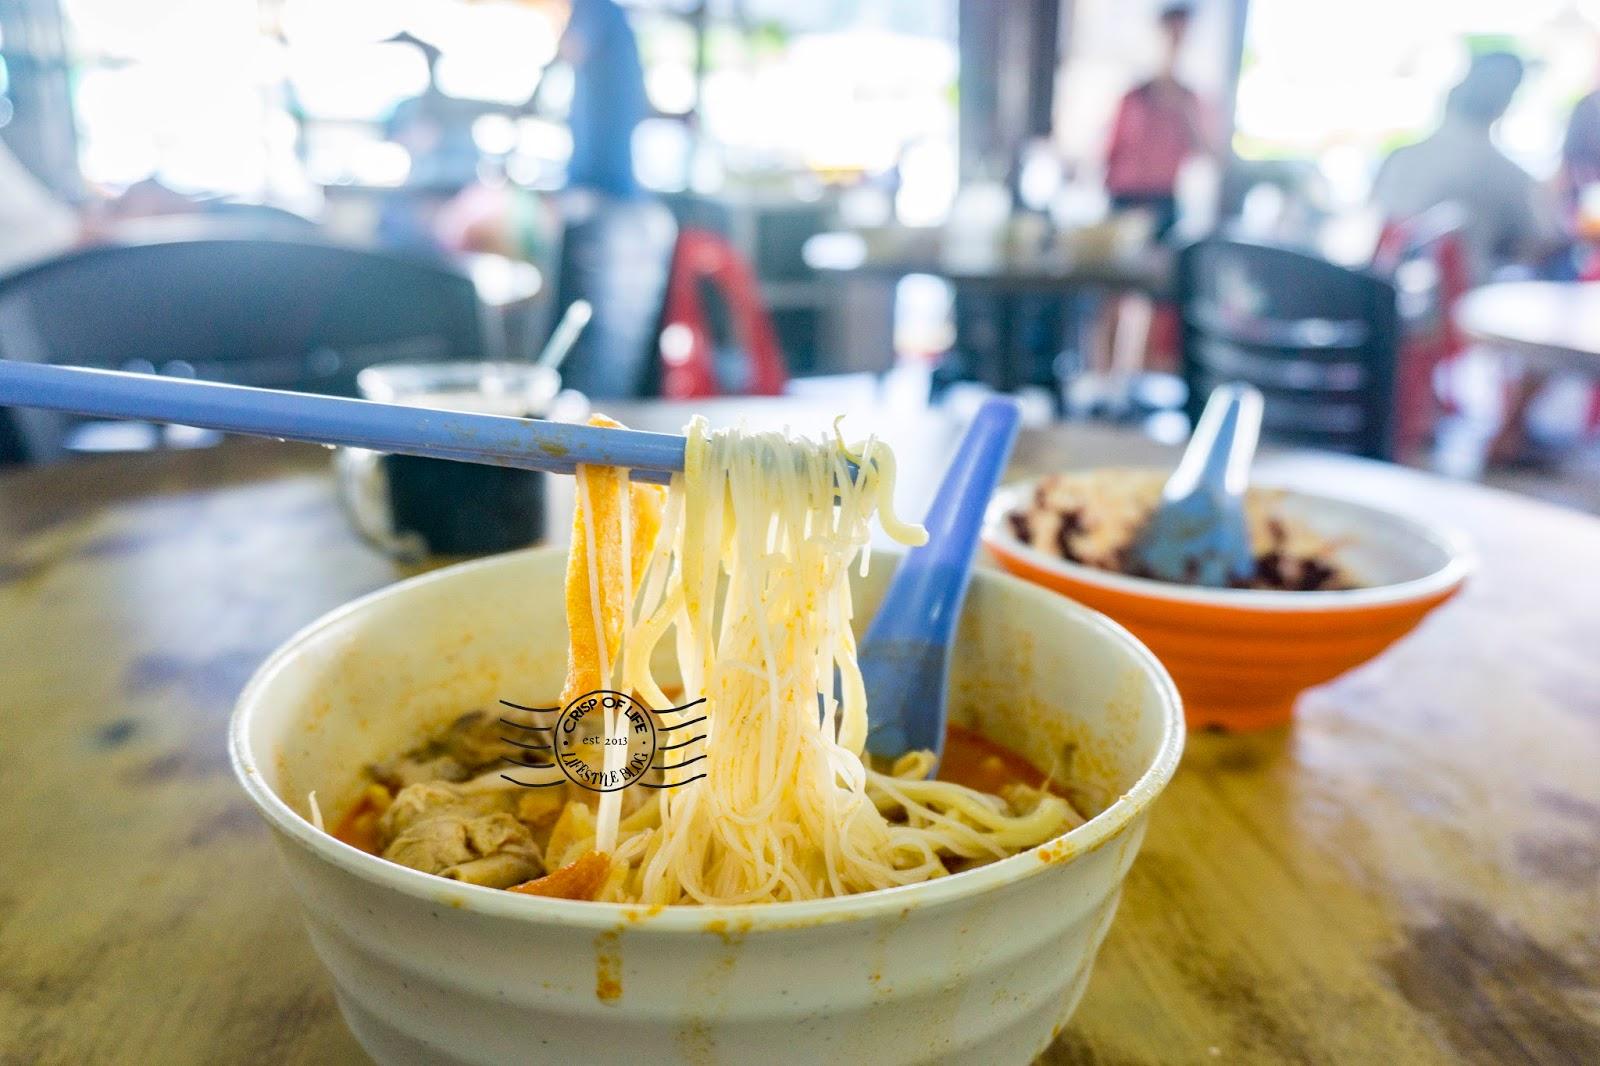 Curry noodle in Alor Setar Lai Huat